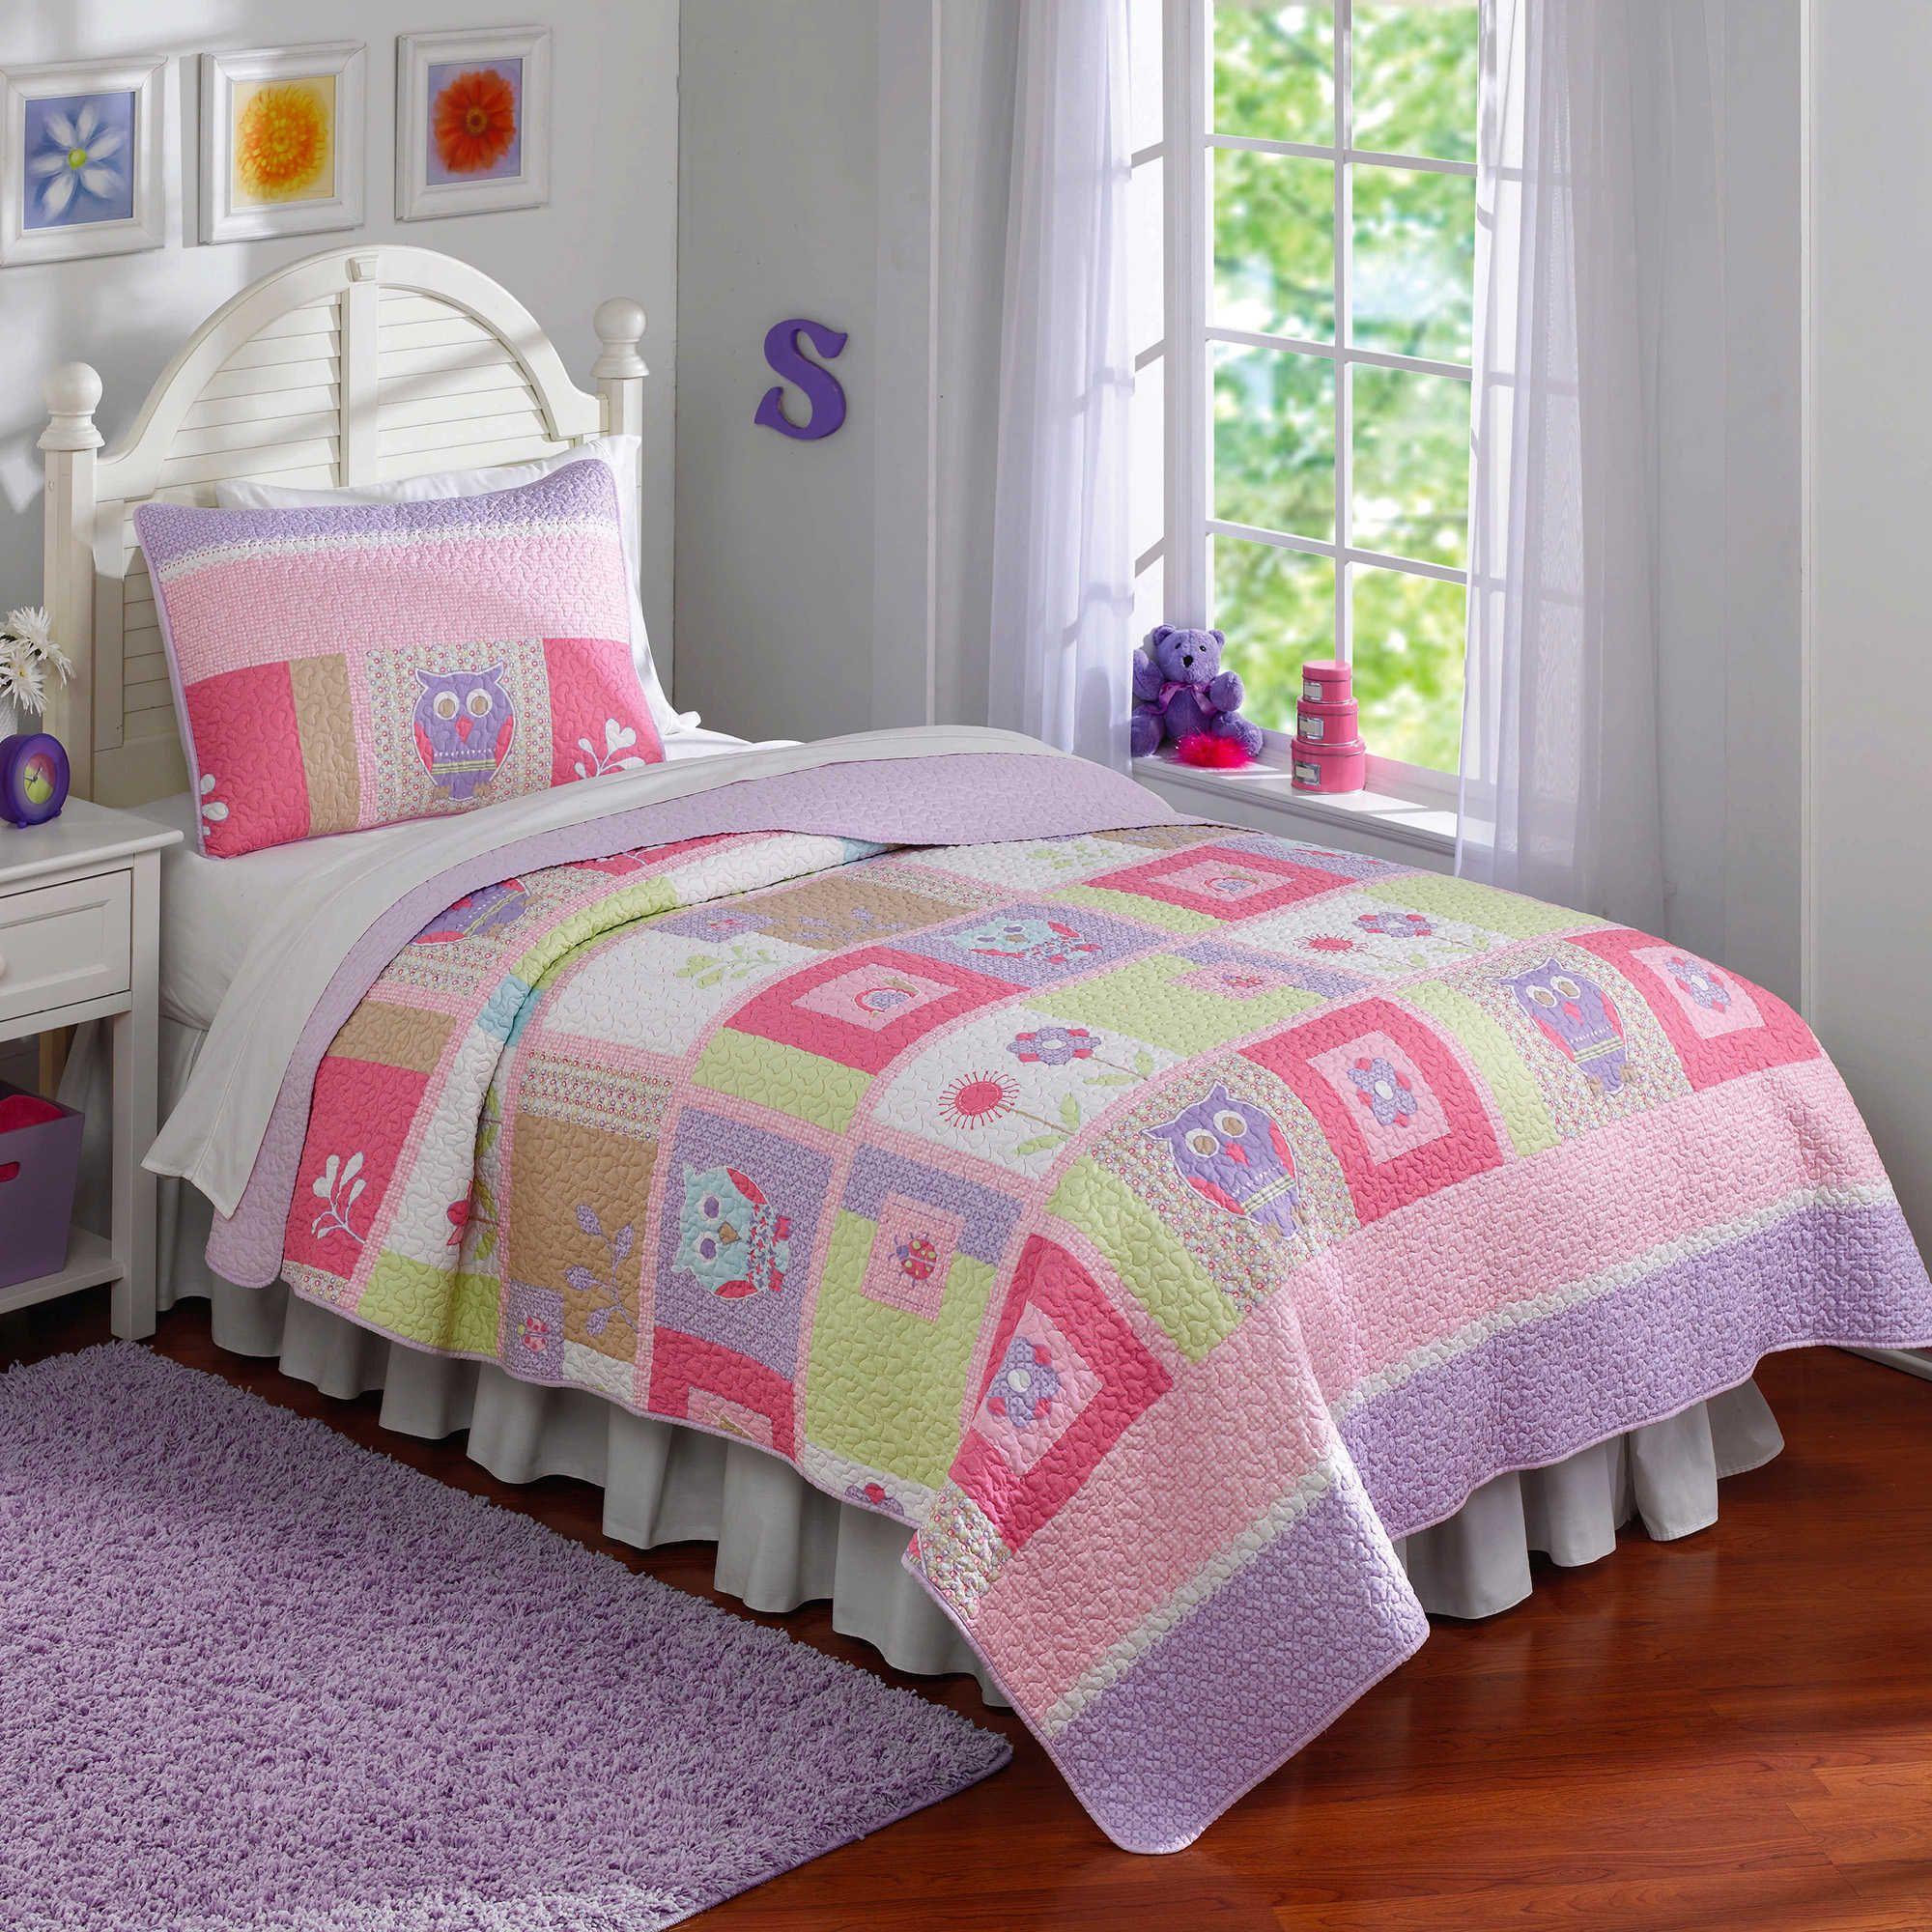 Happy Owls 3piece Quilt Set (Queen 3 Piece), Pink, Pem